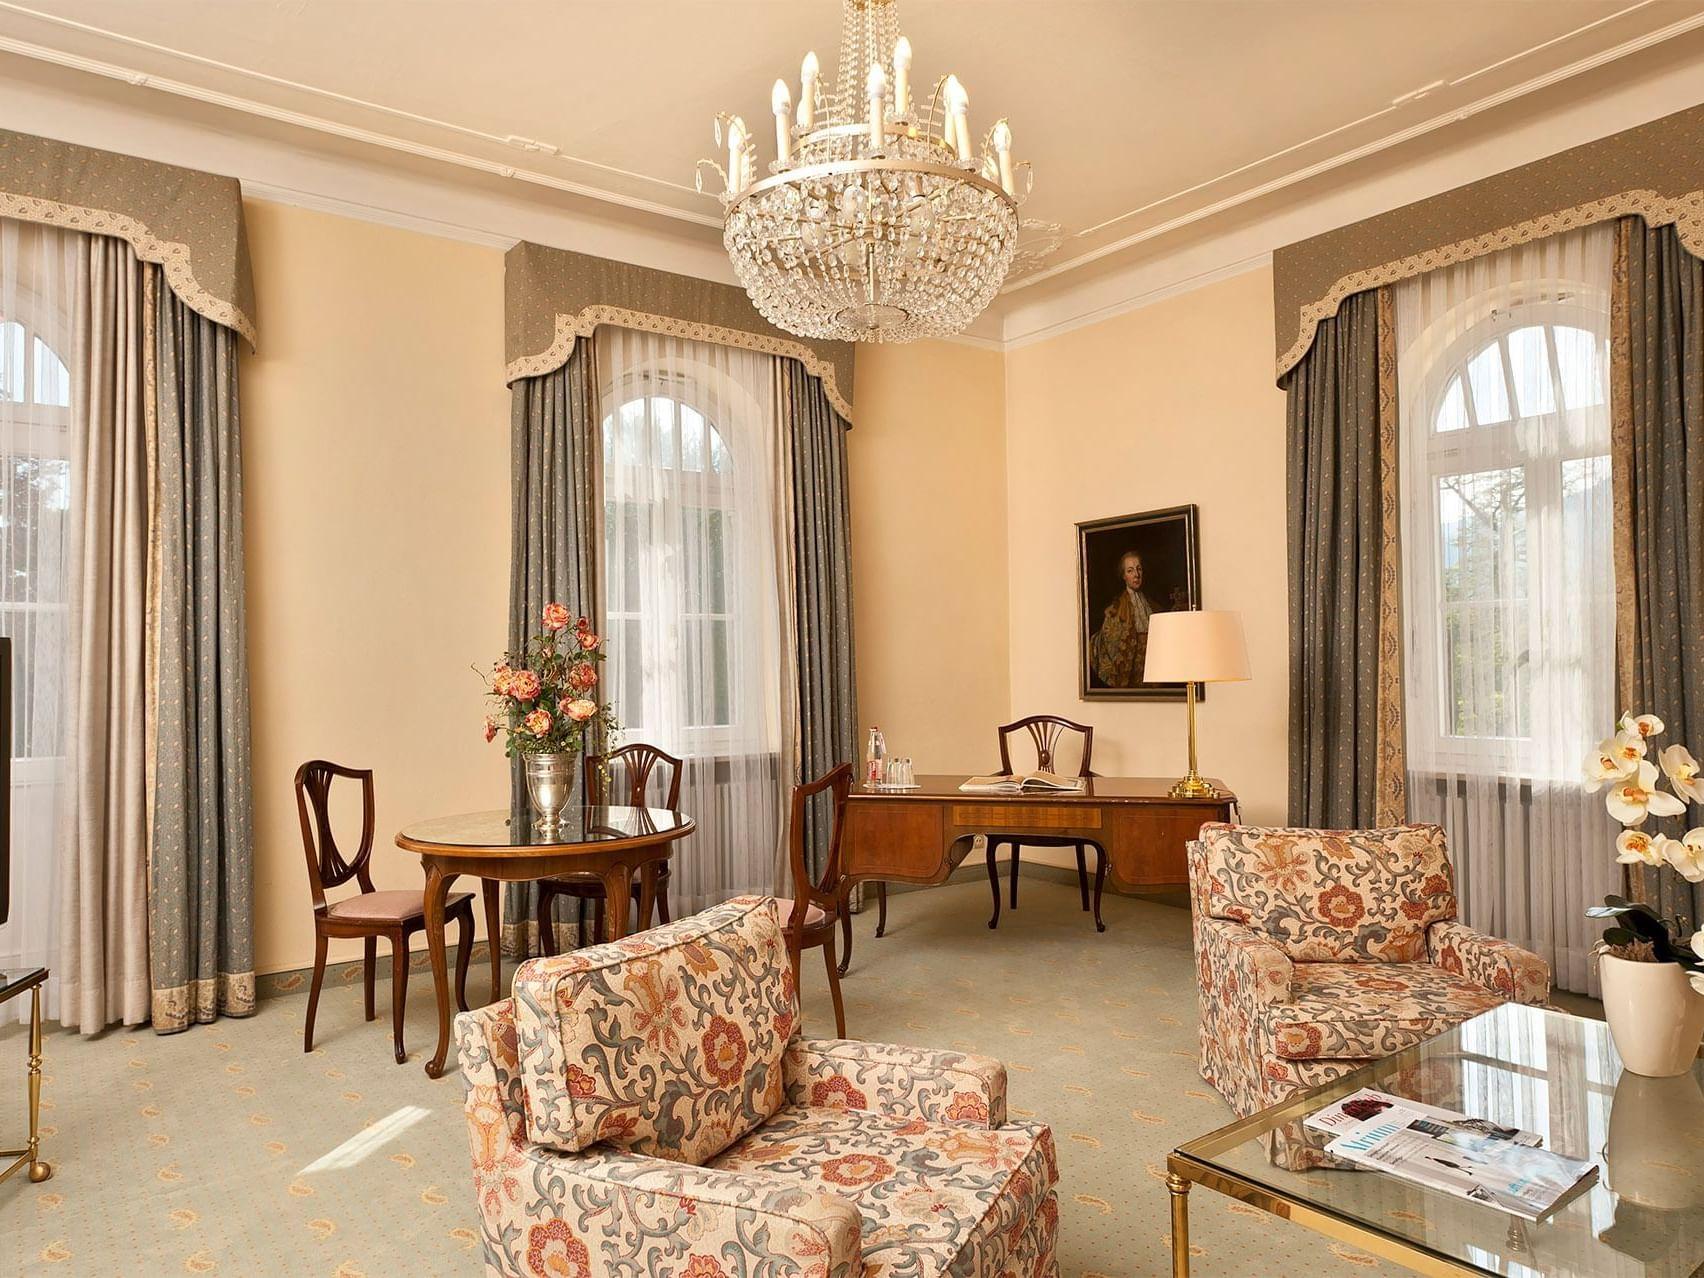 Family Apartment Living Room at Precise Bad Reichenhall Bavaria